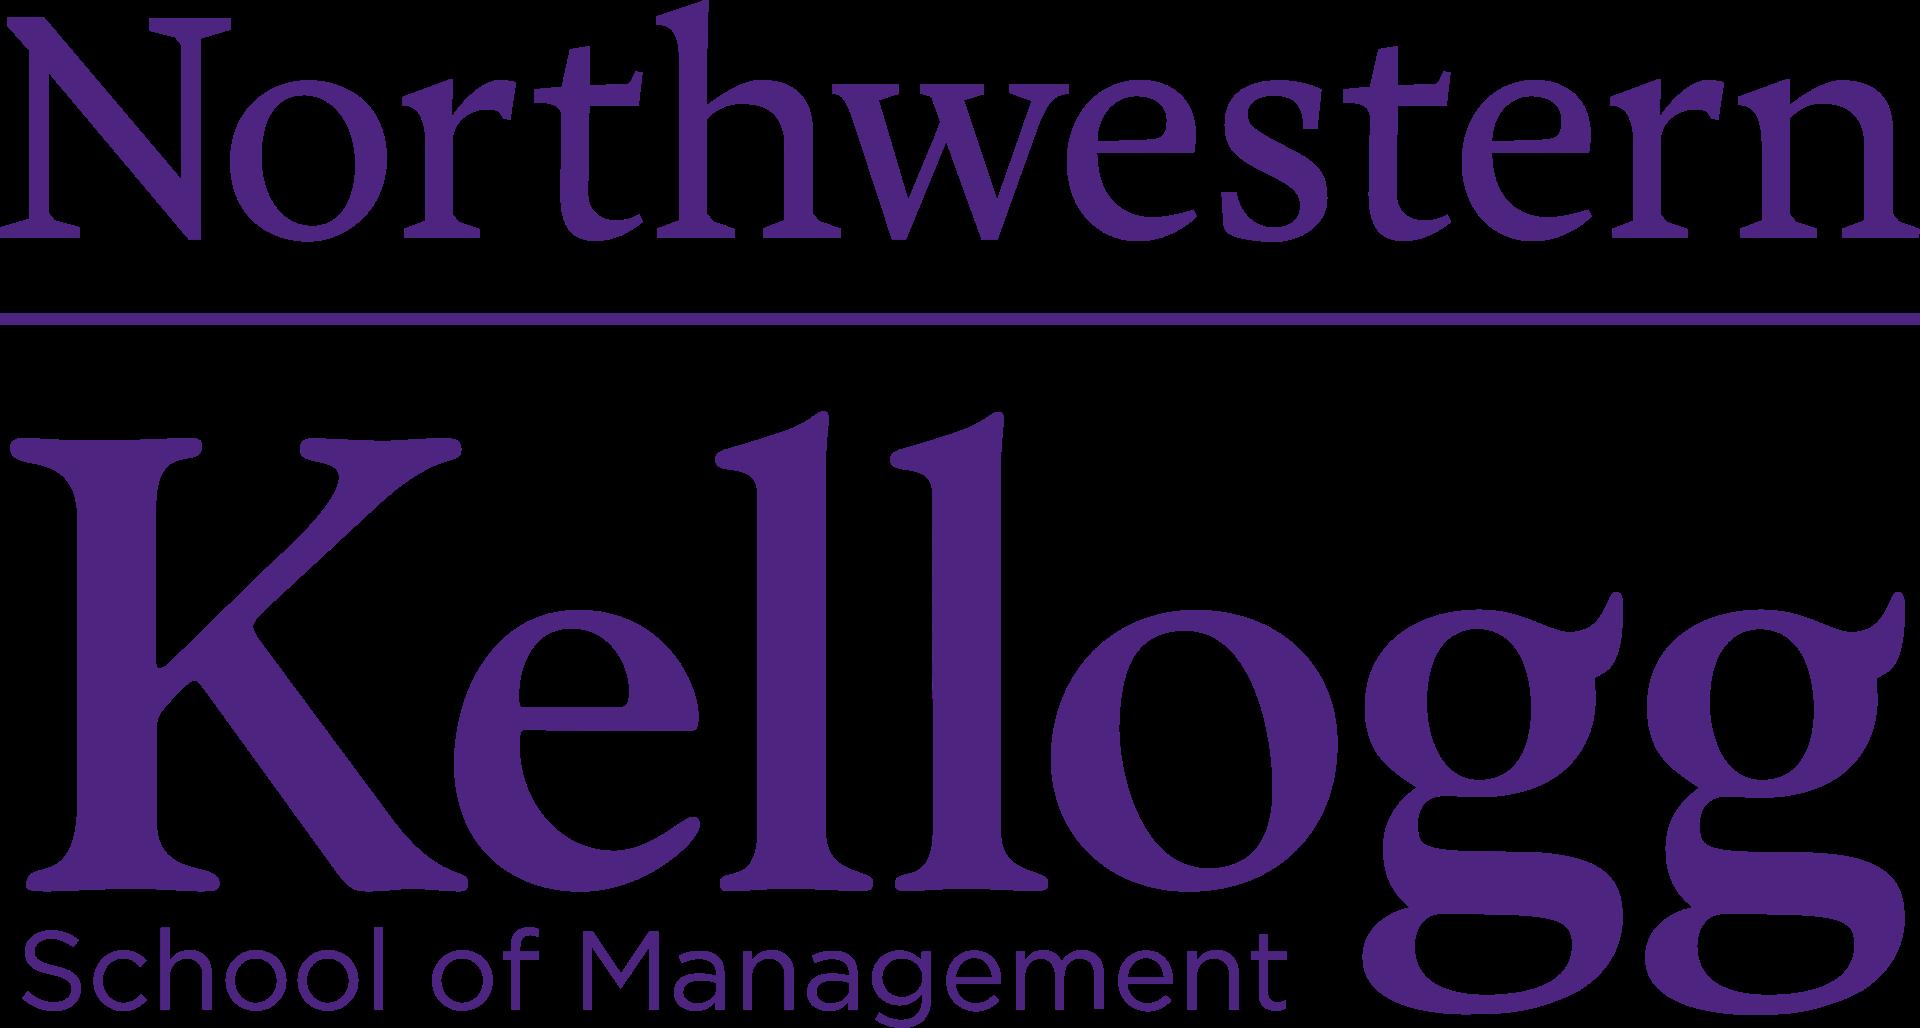 kellogg school of management Kellogg school, National